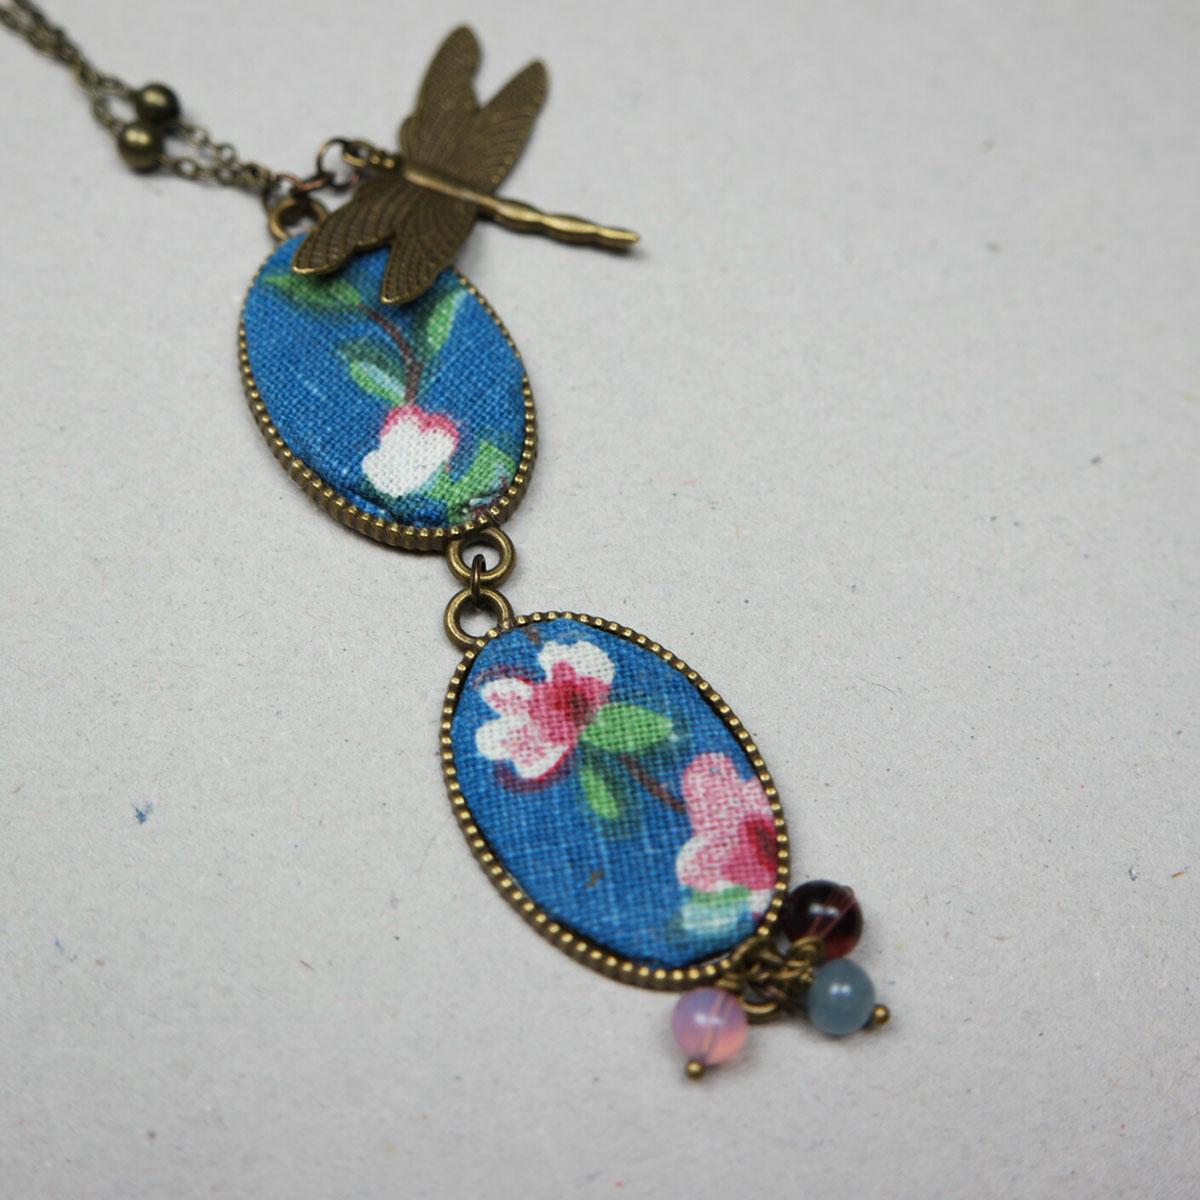 pendente collana fanè libellula stoffa retrò vintage